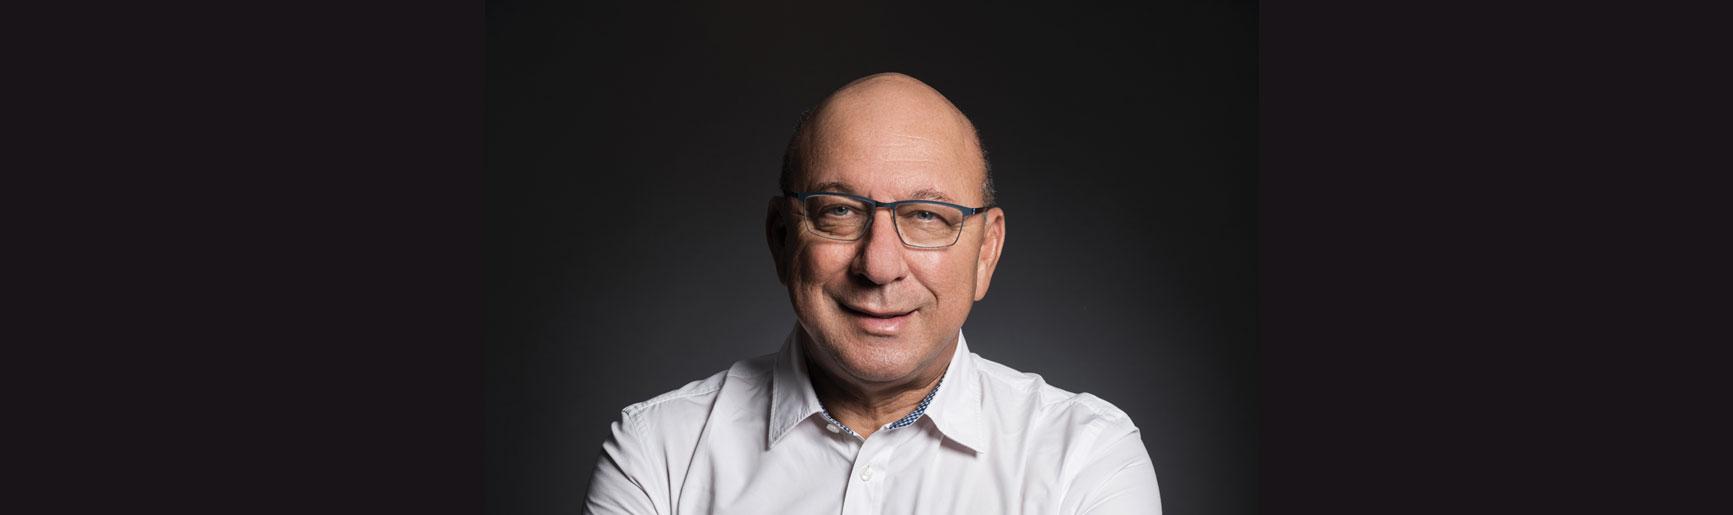 Trevor Manuel opening doors for investors